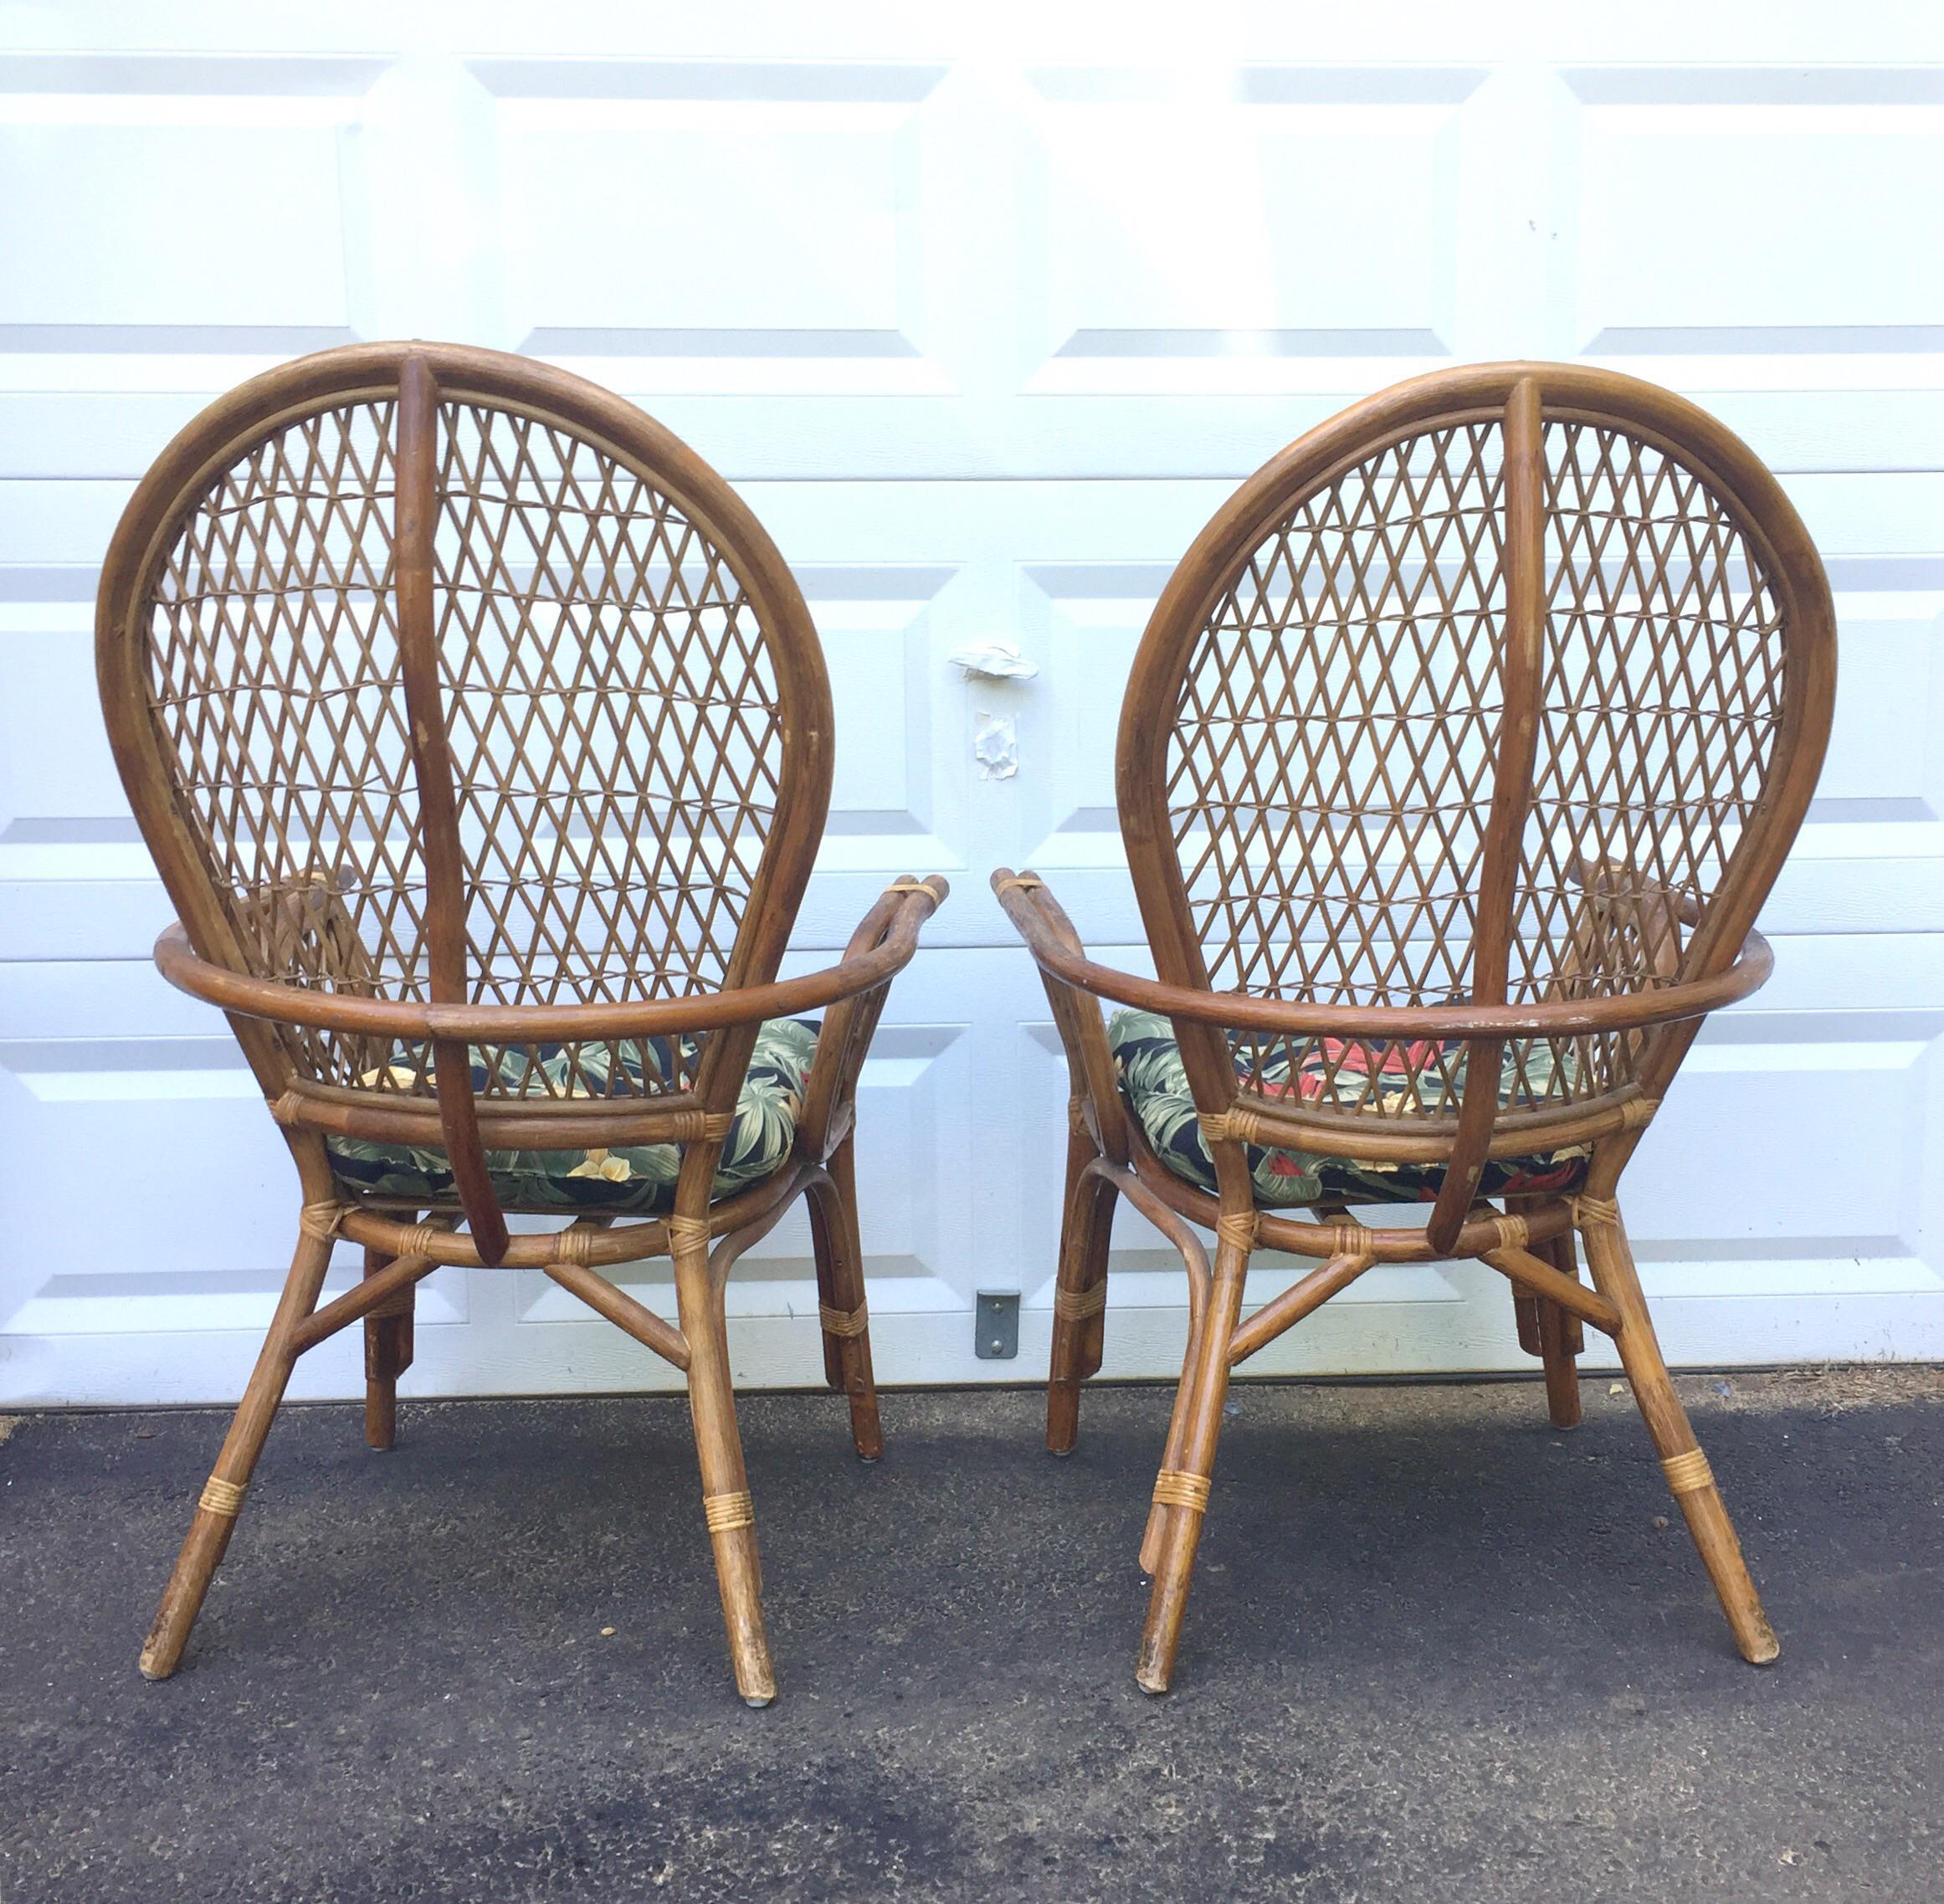 Vintage Modern Bamboo U0026 Rattan High Back Chairs   Image 6 Of 11